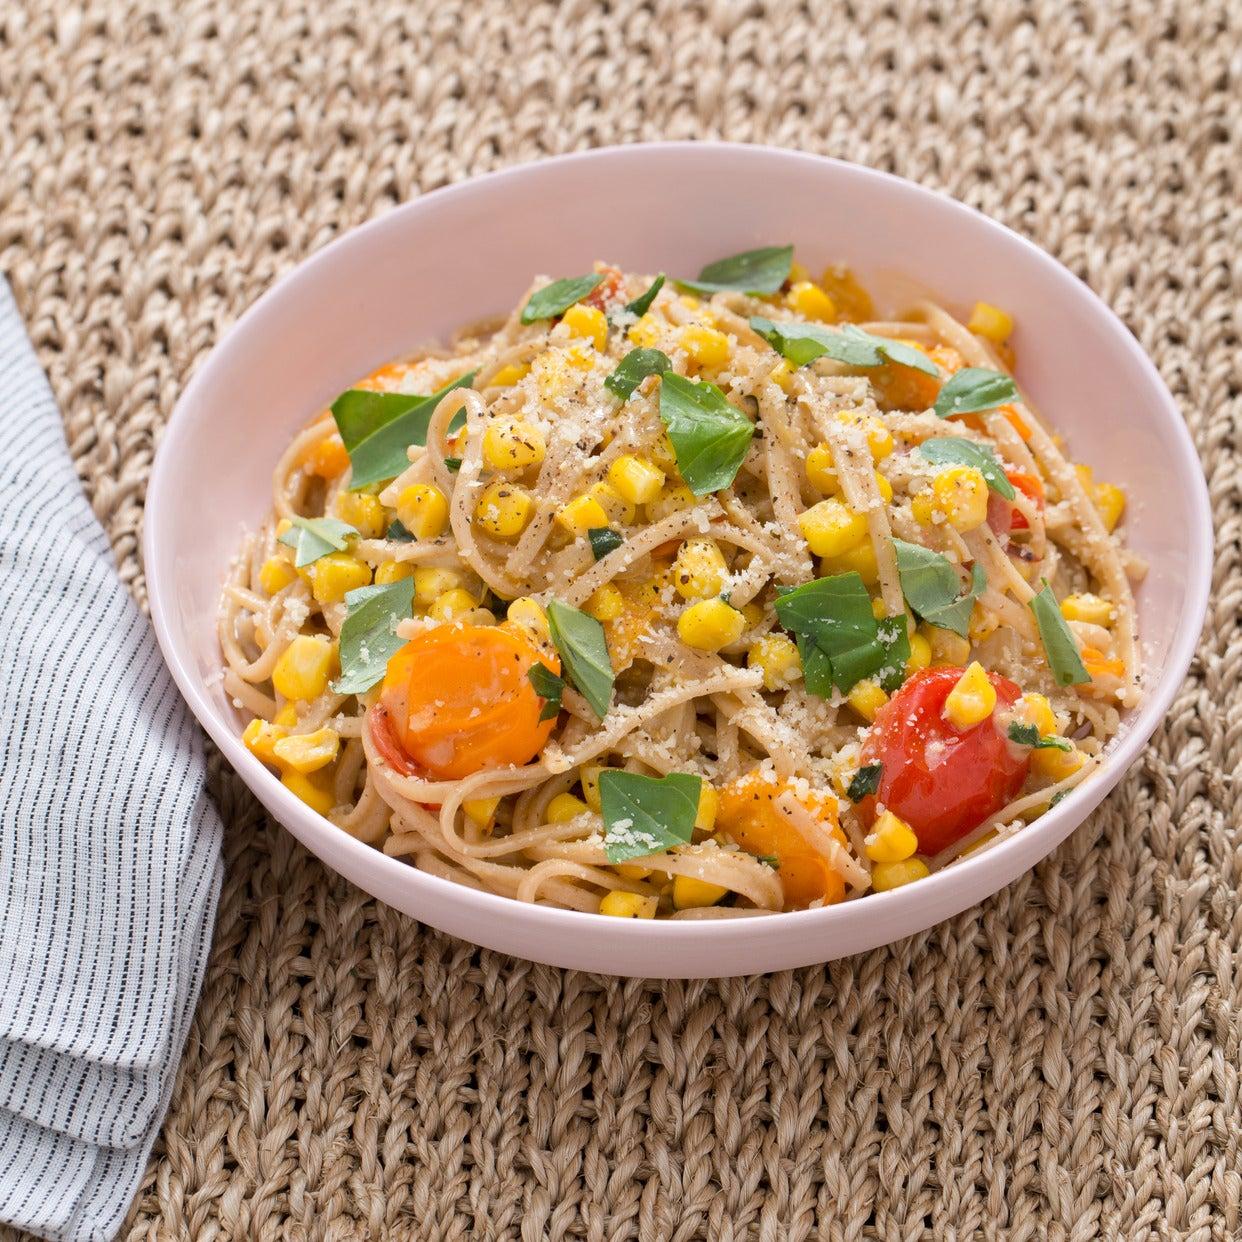 Whole Grain Spaghetti with Corn, Cherry Tomatoes & Mascarpone Cheese